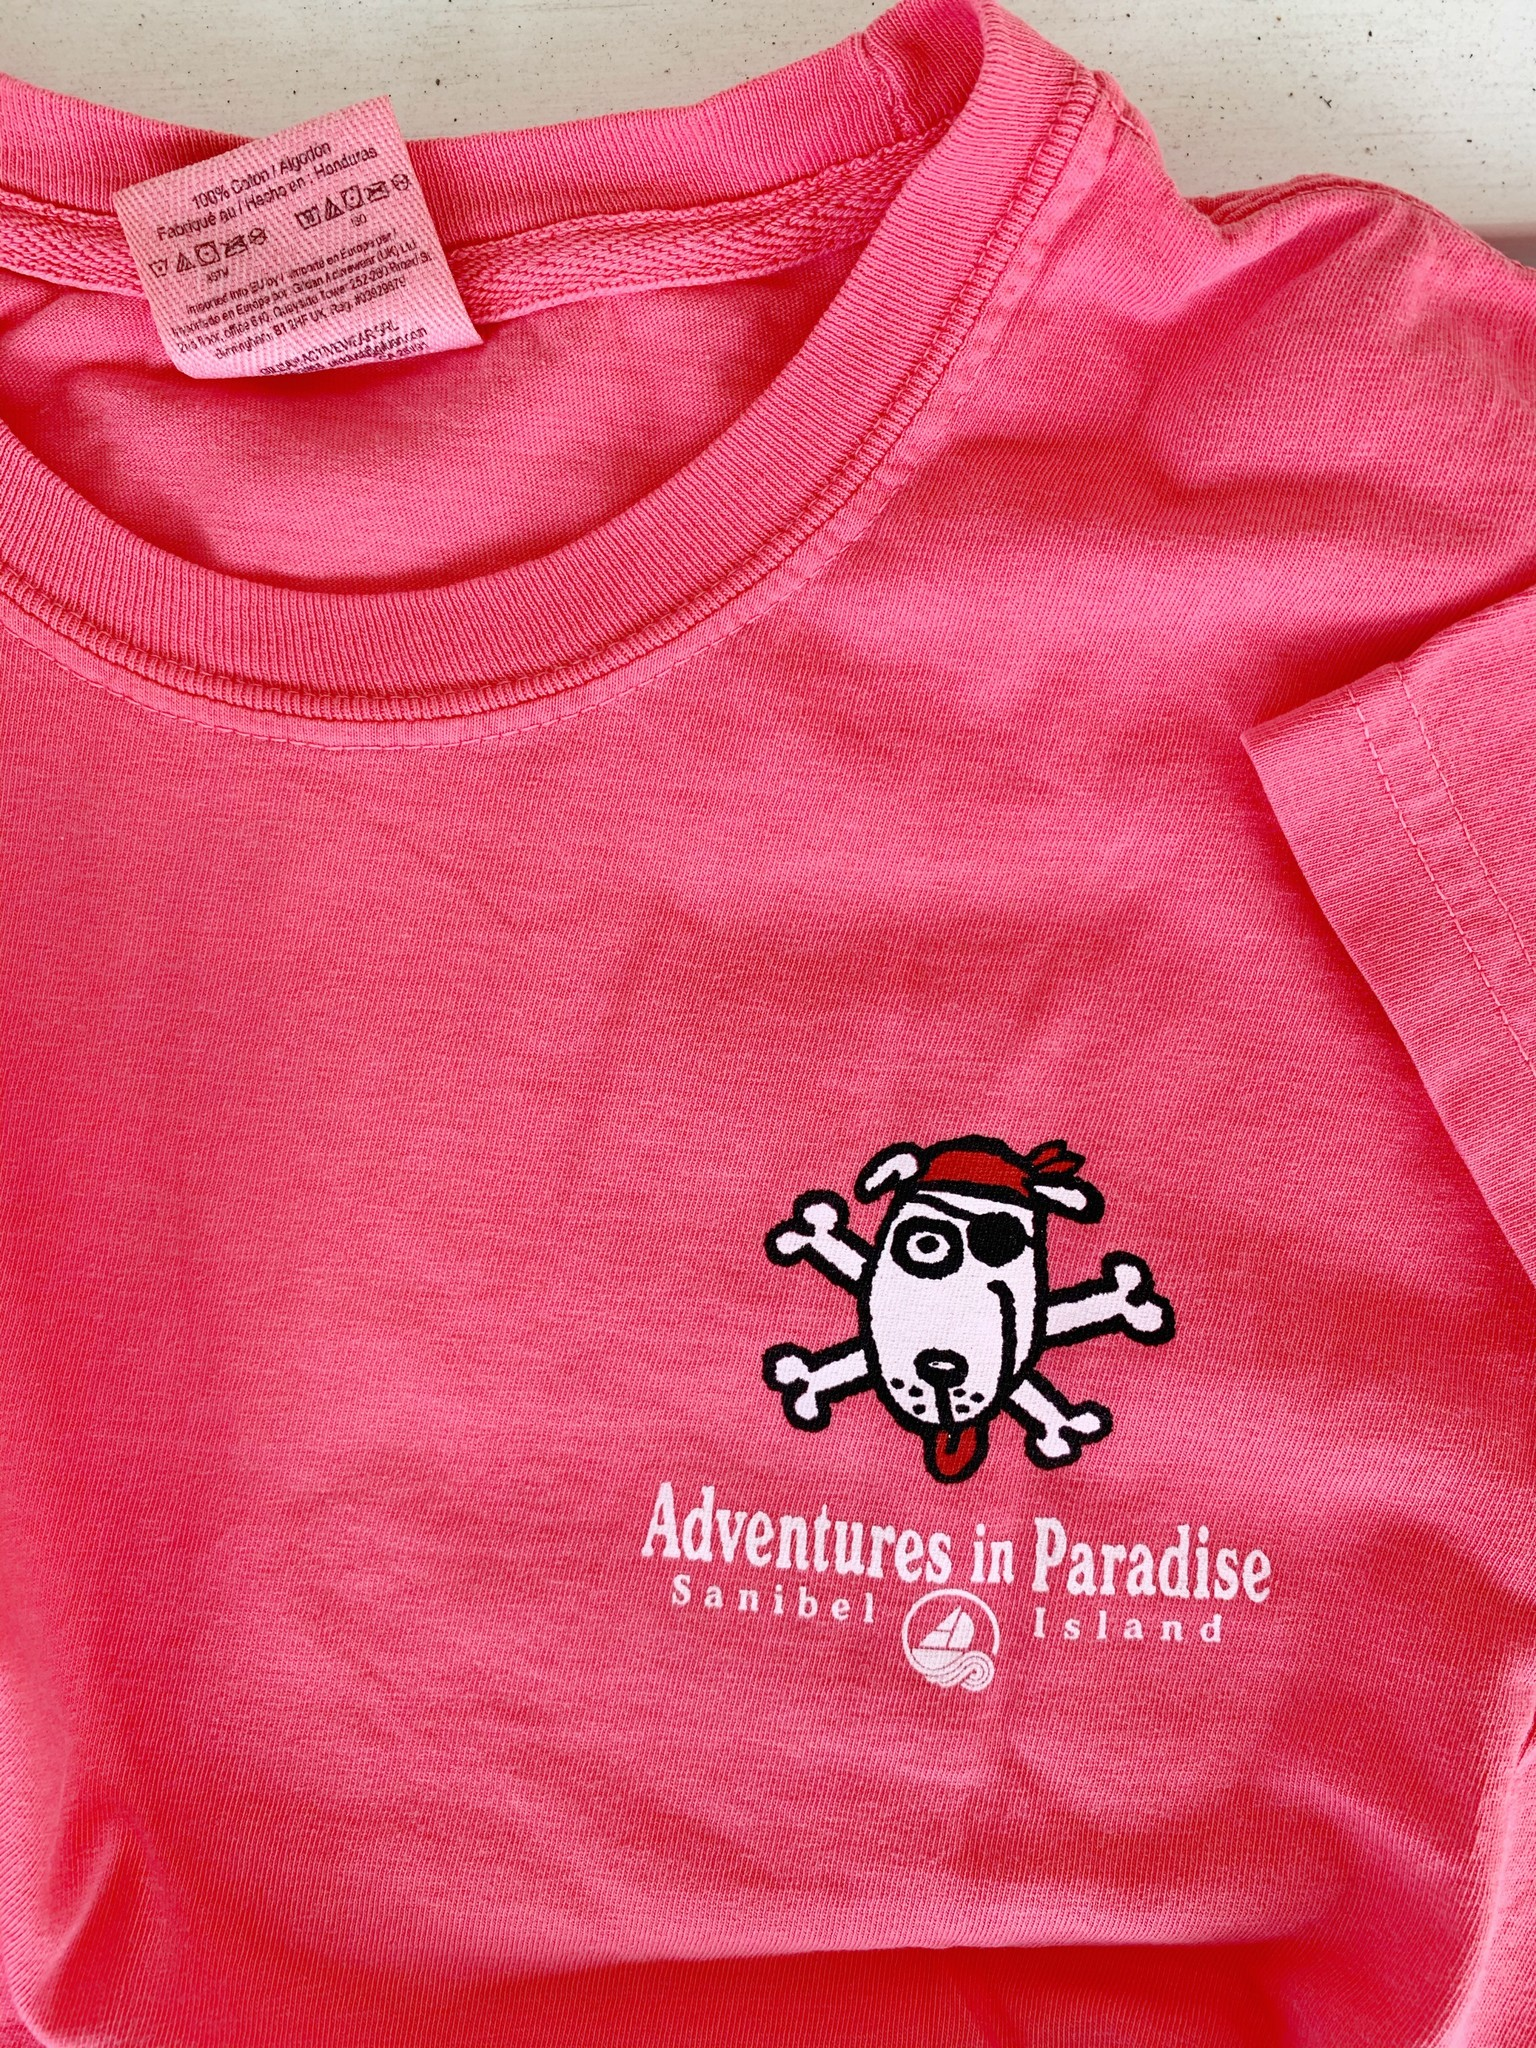 BIG HED DESIGNS Sanibel Kids Tshirt Pirate Dog - Watermelon